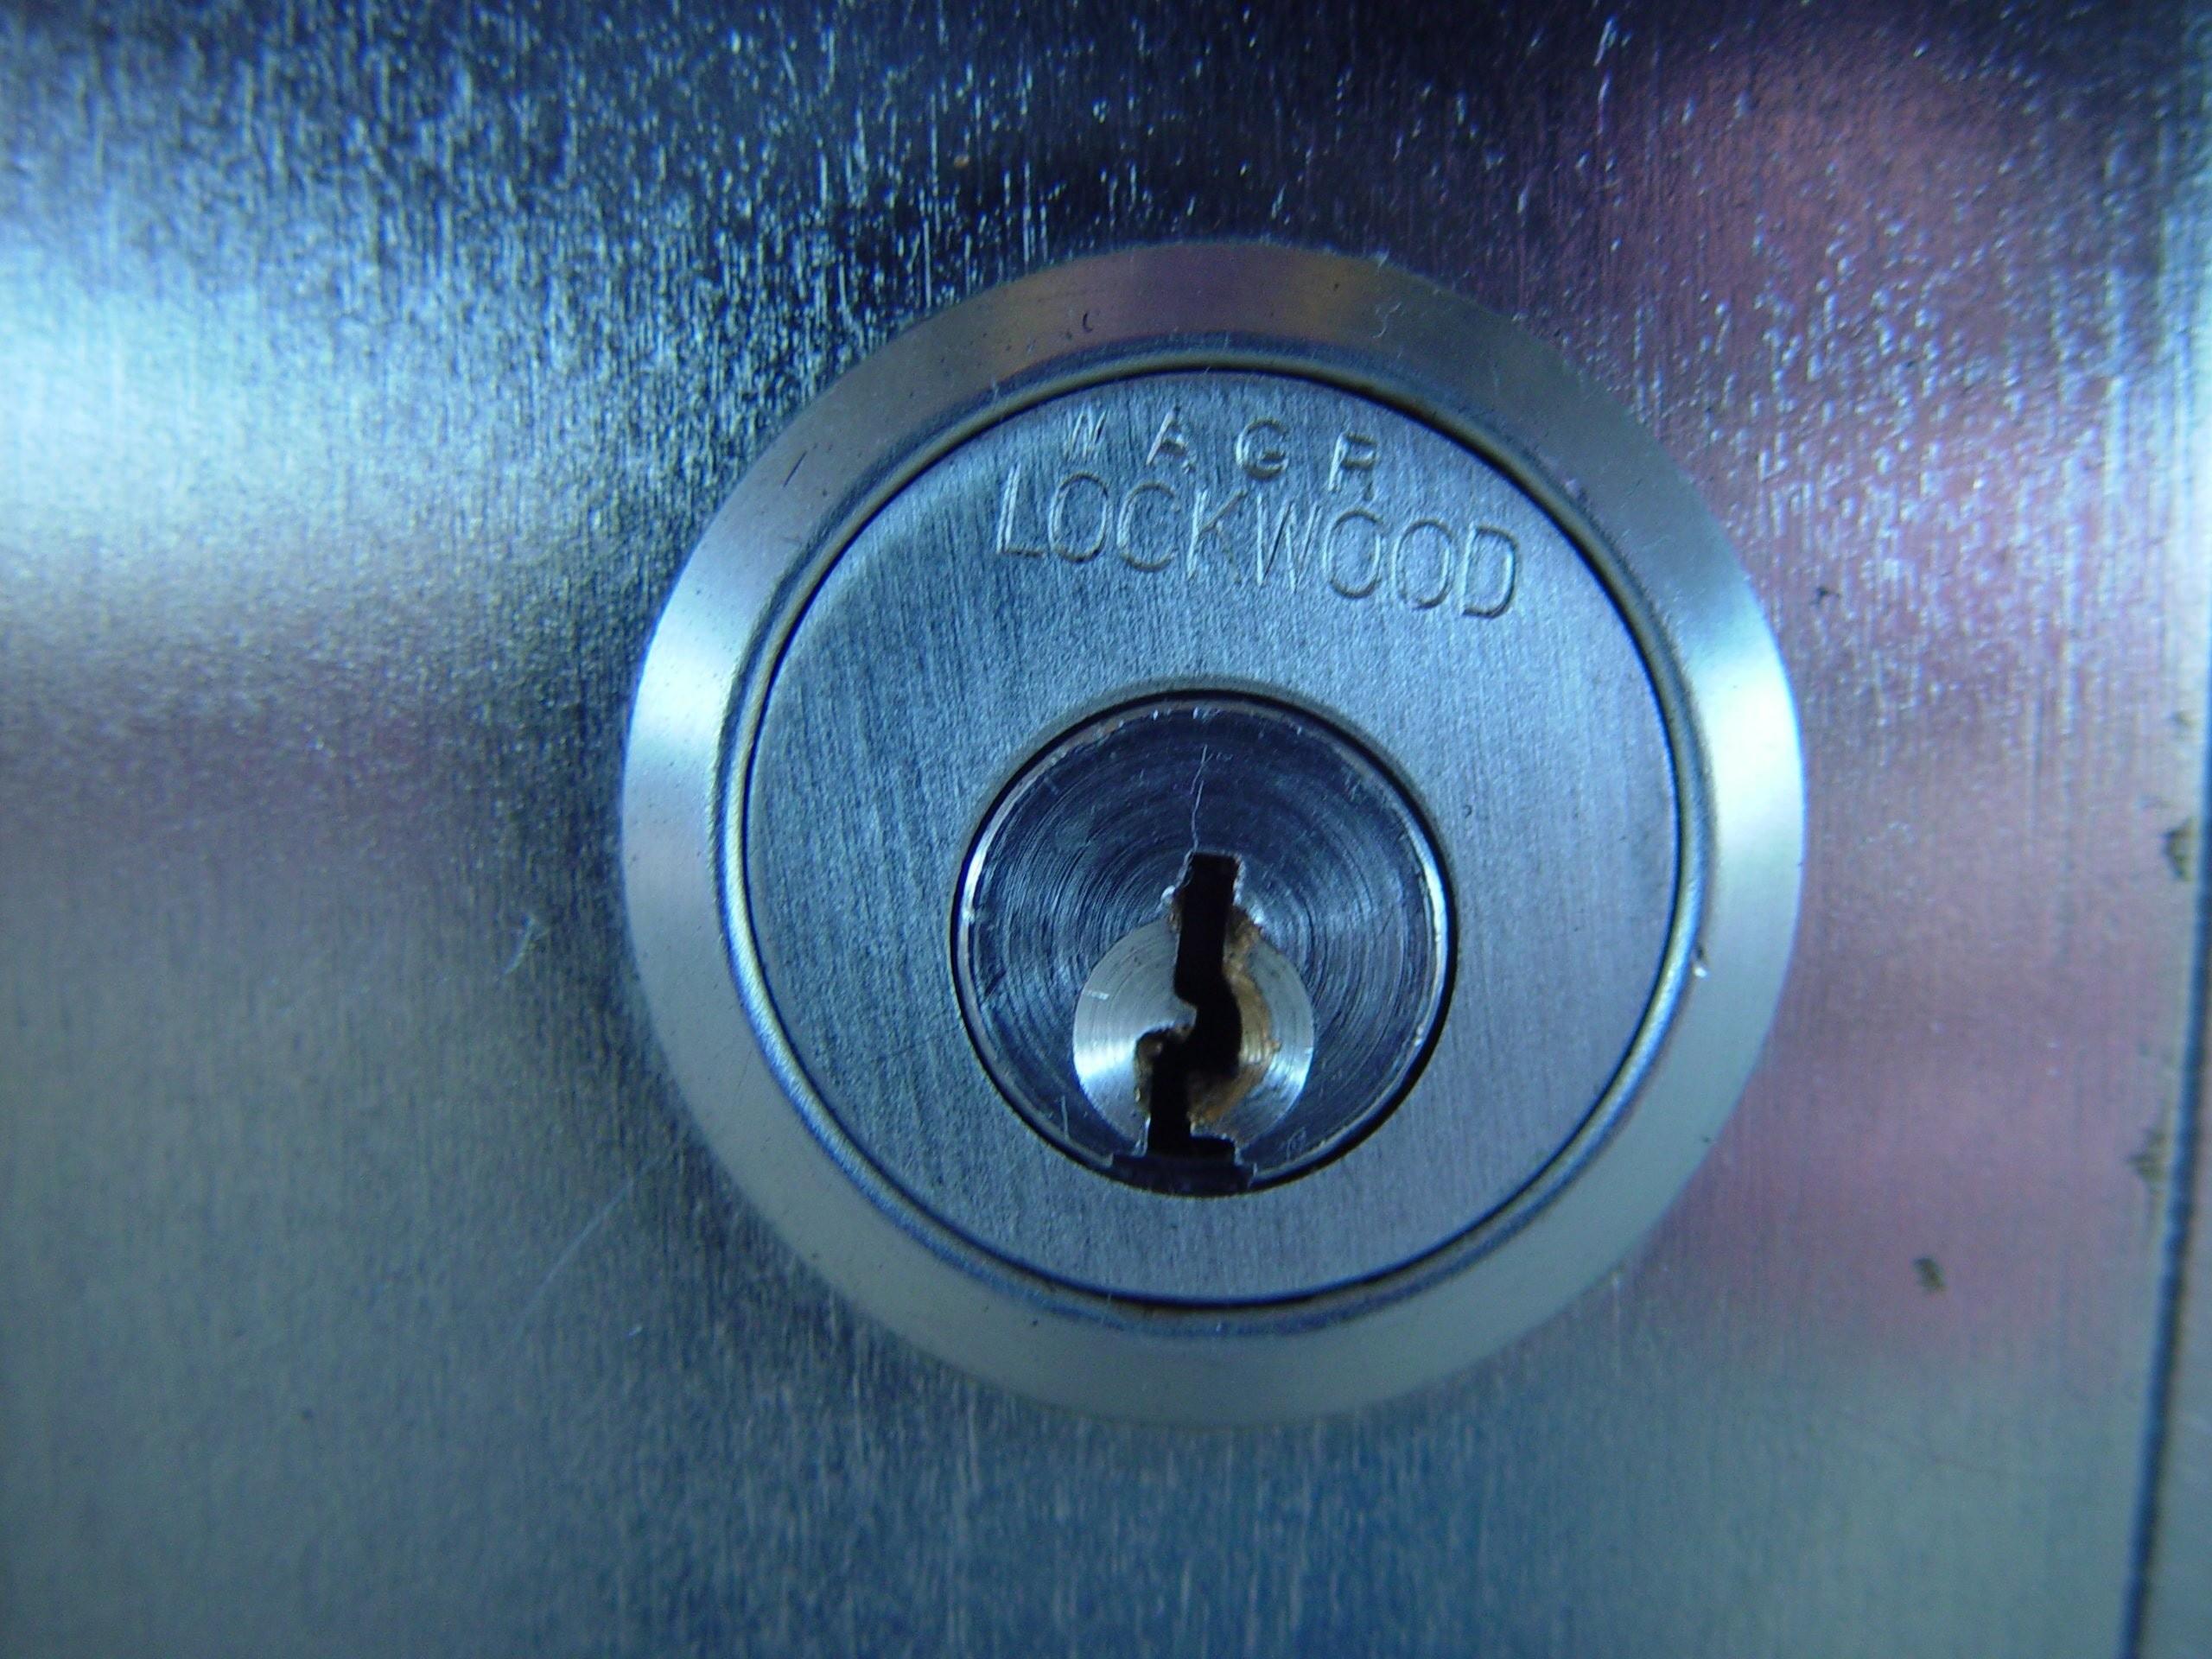 stainless steel lockwood lock